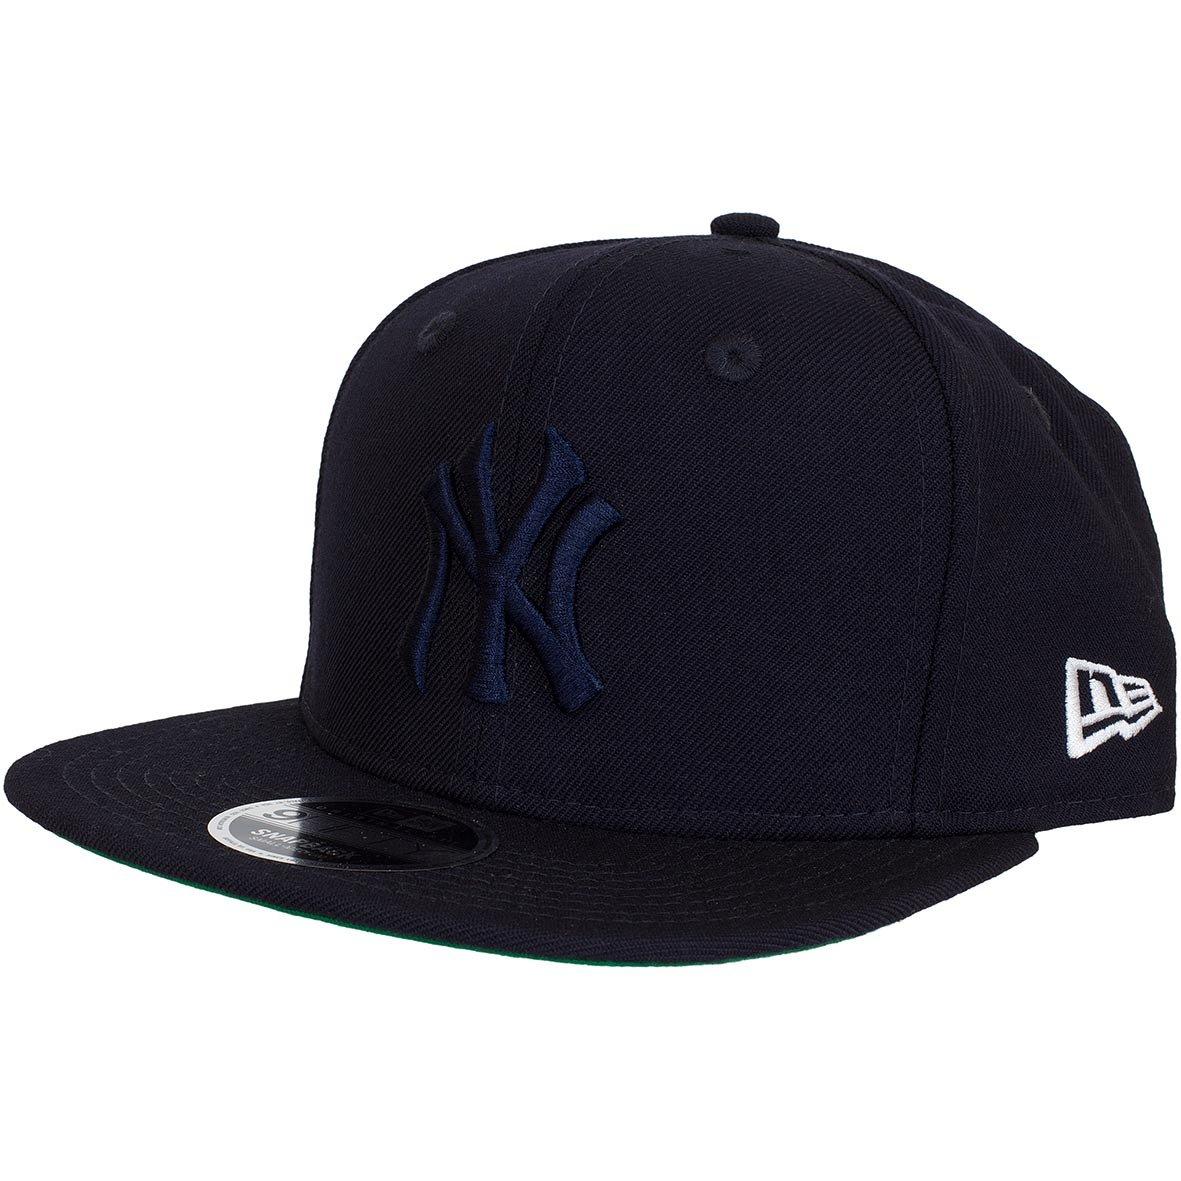 Gorra New Era - 9Fifty Mlb New York Yankees Winners Patch azul ...